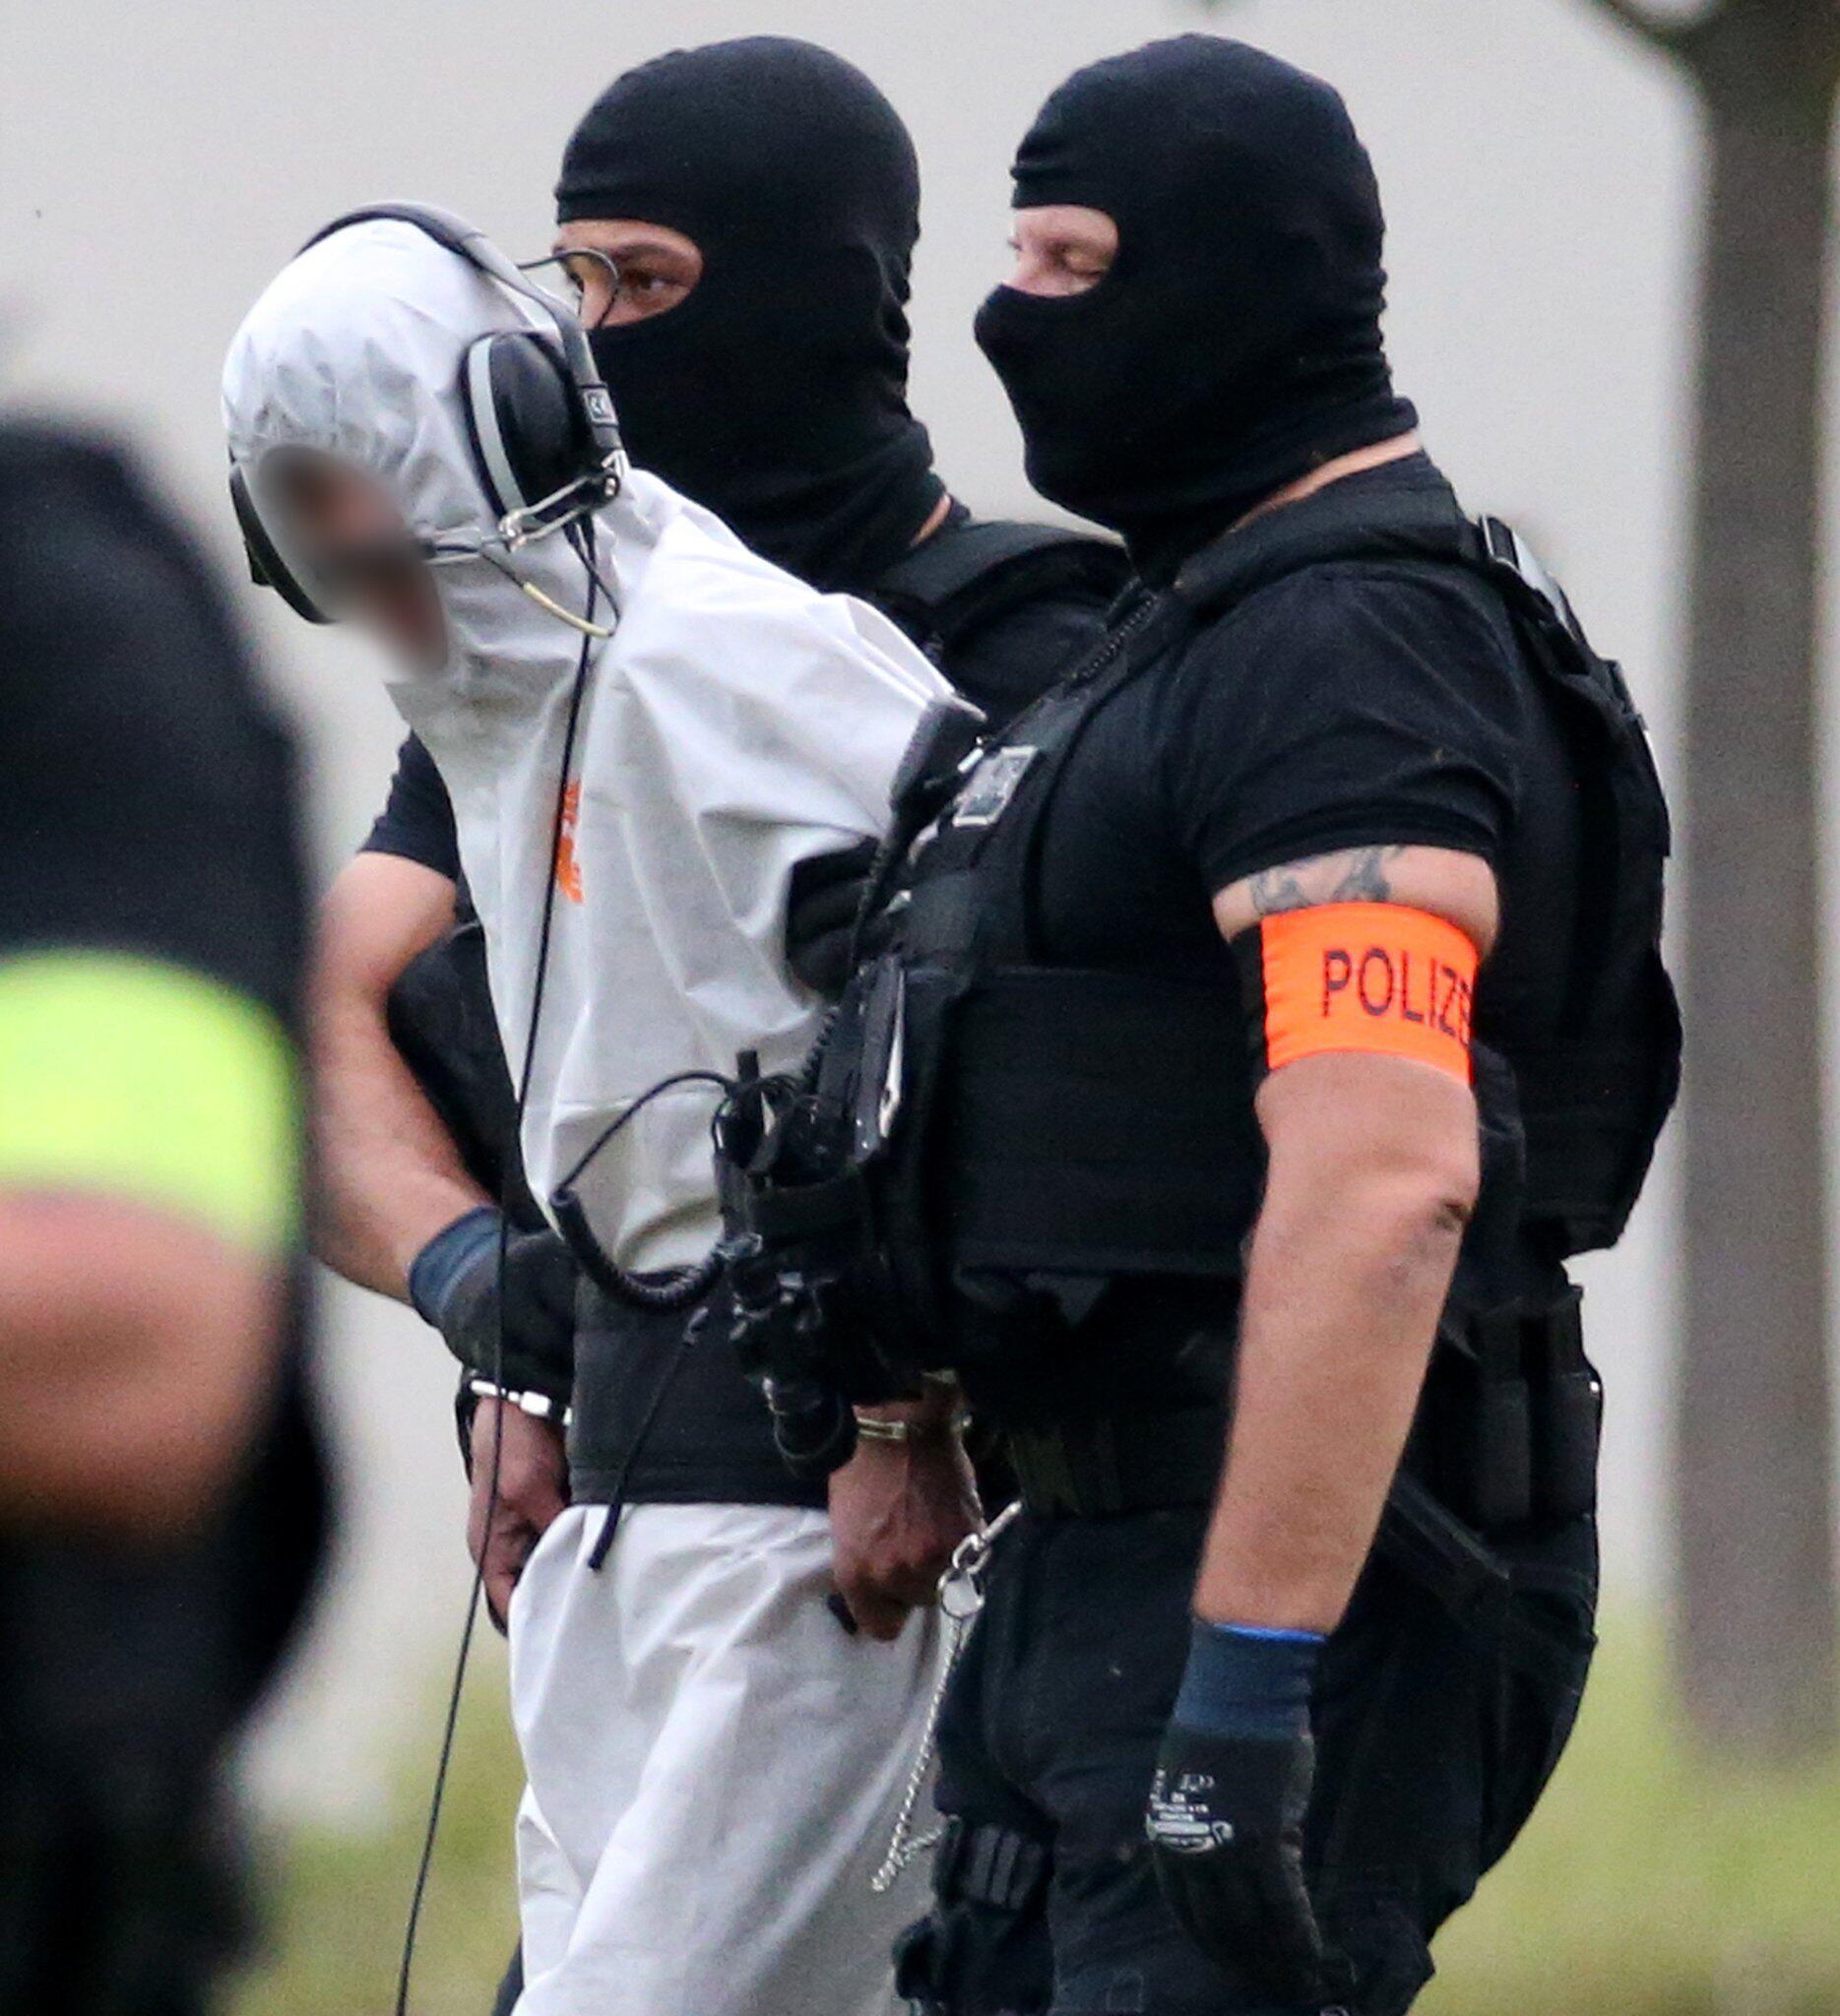 Bild zu Todesfall Susanna - Tatverdächtiger kommt in U-Haft